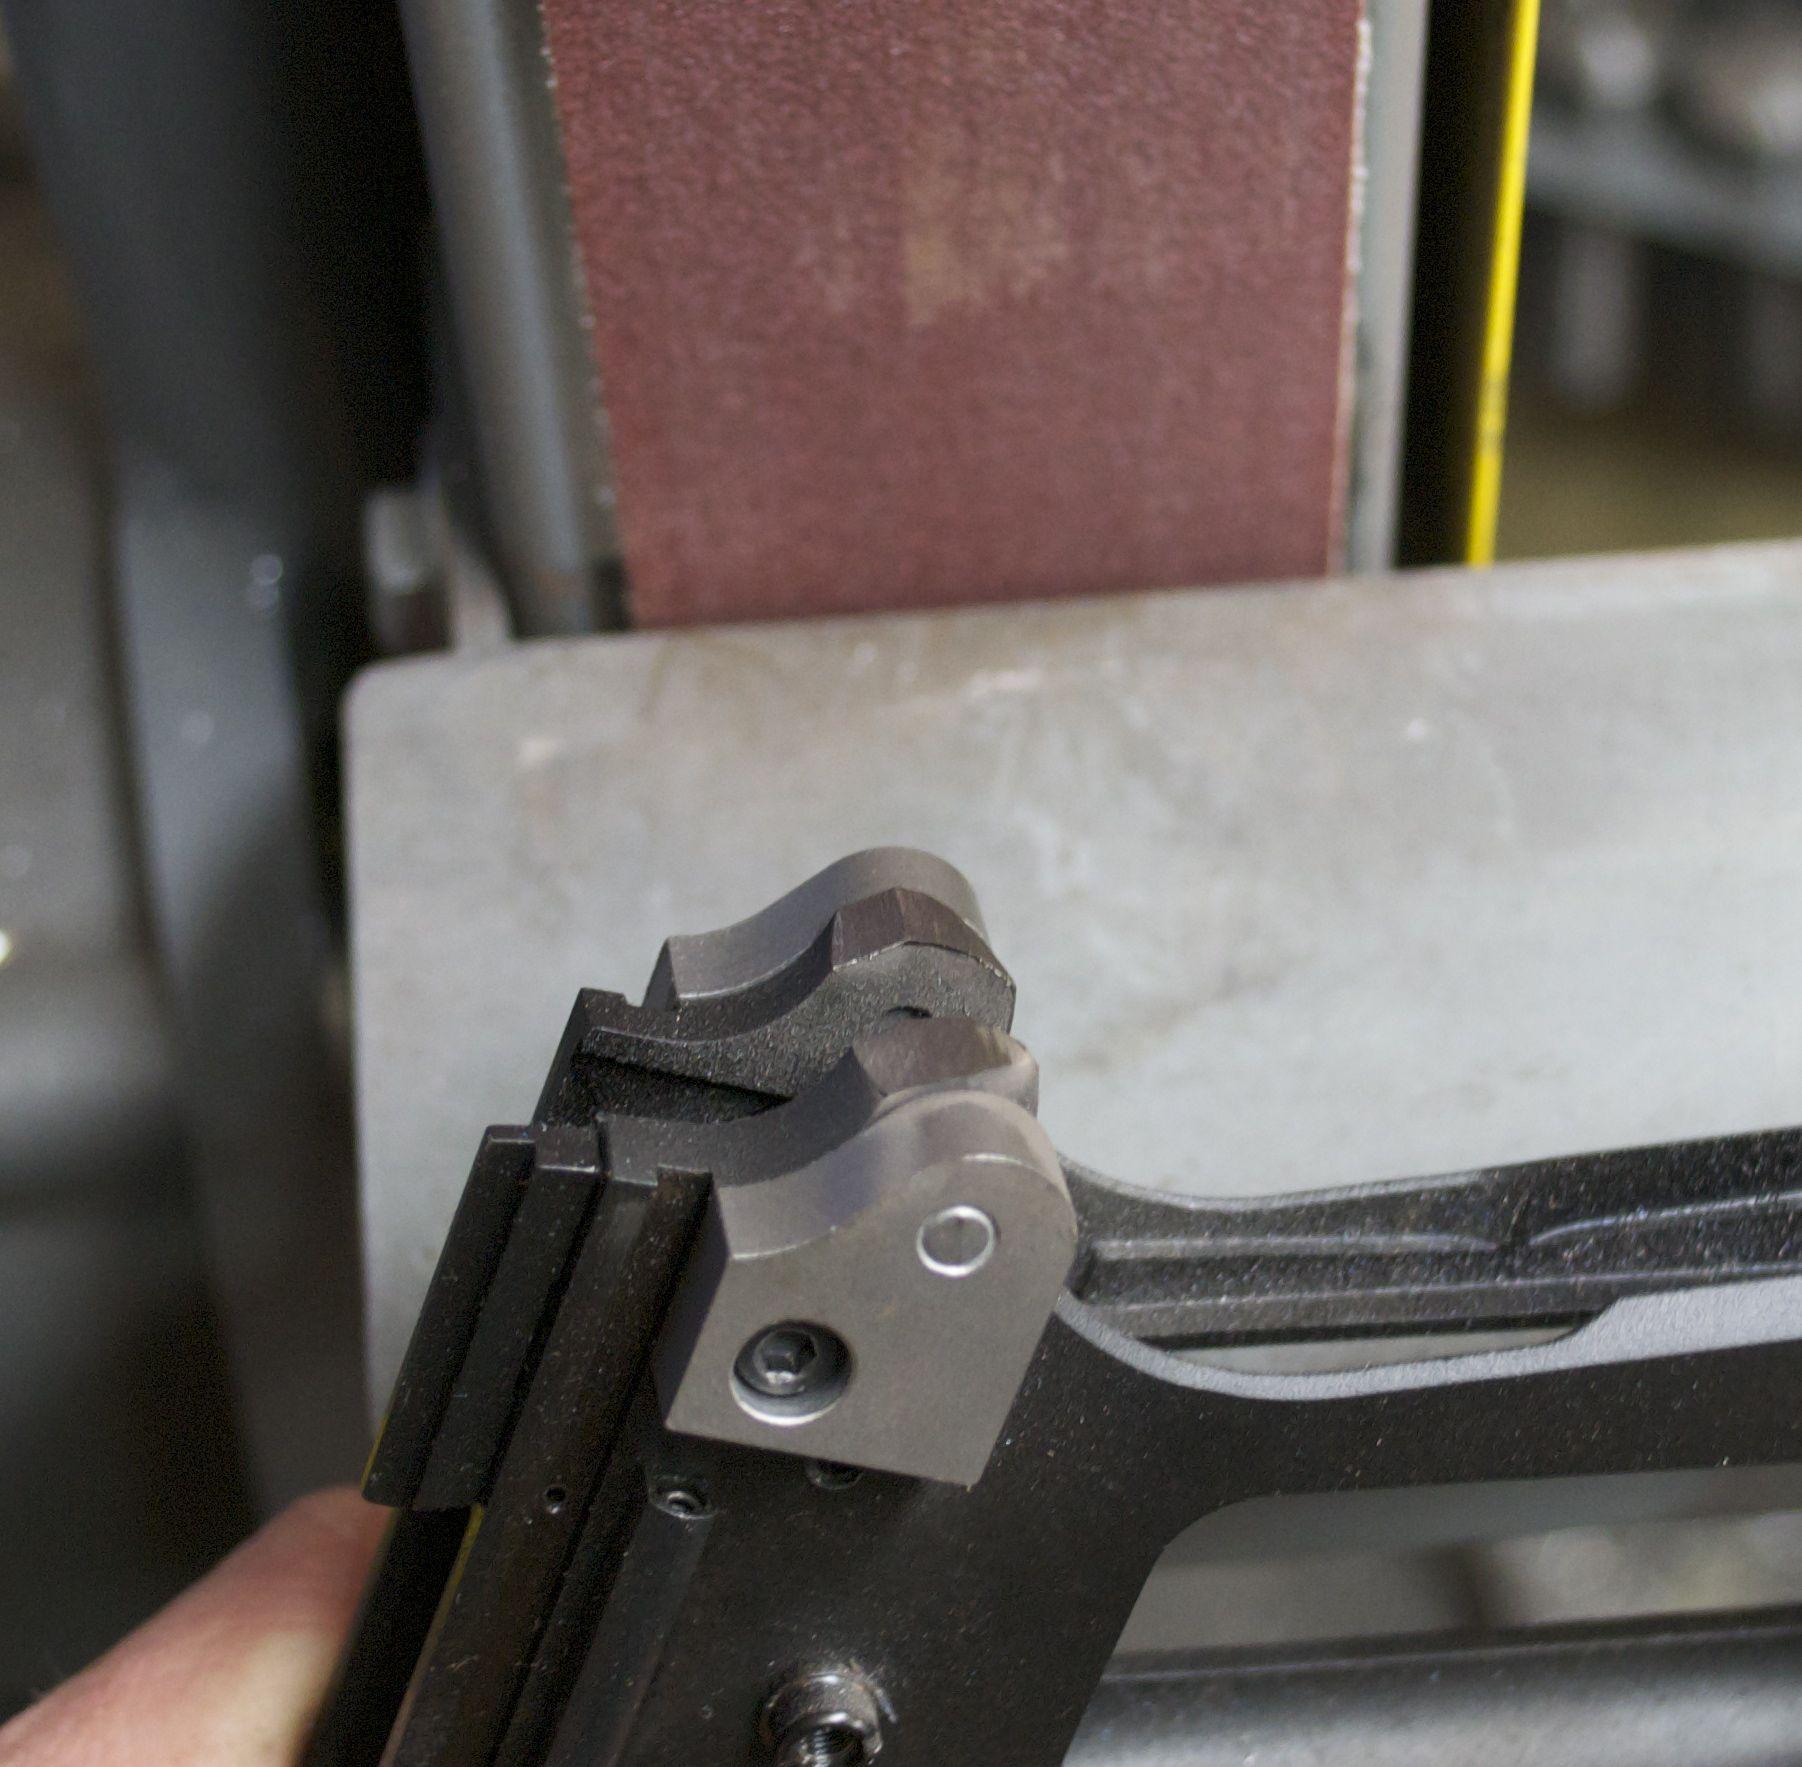 R1 beavertail on grinder 2